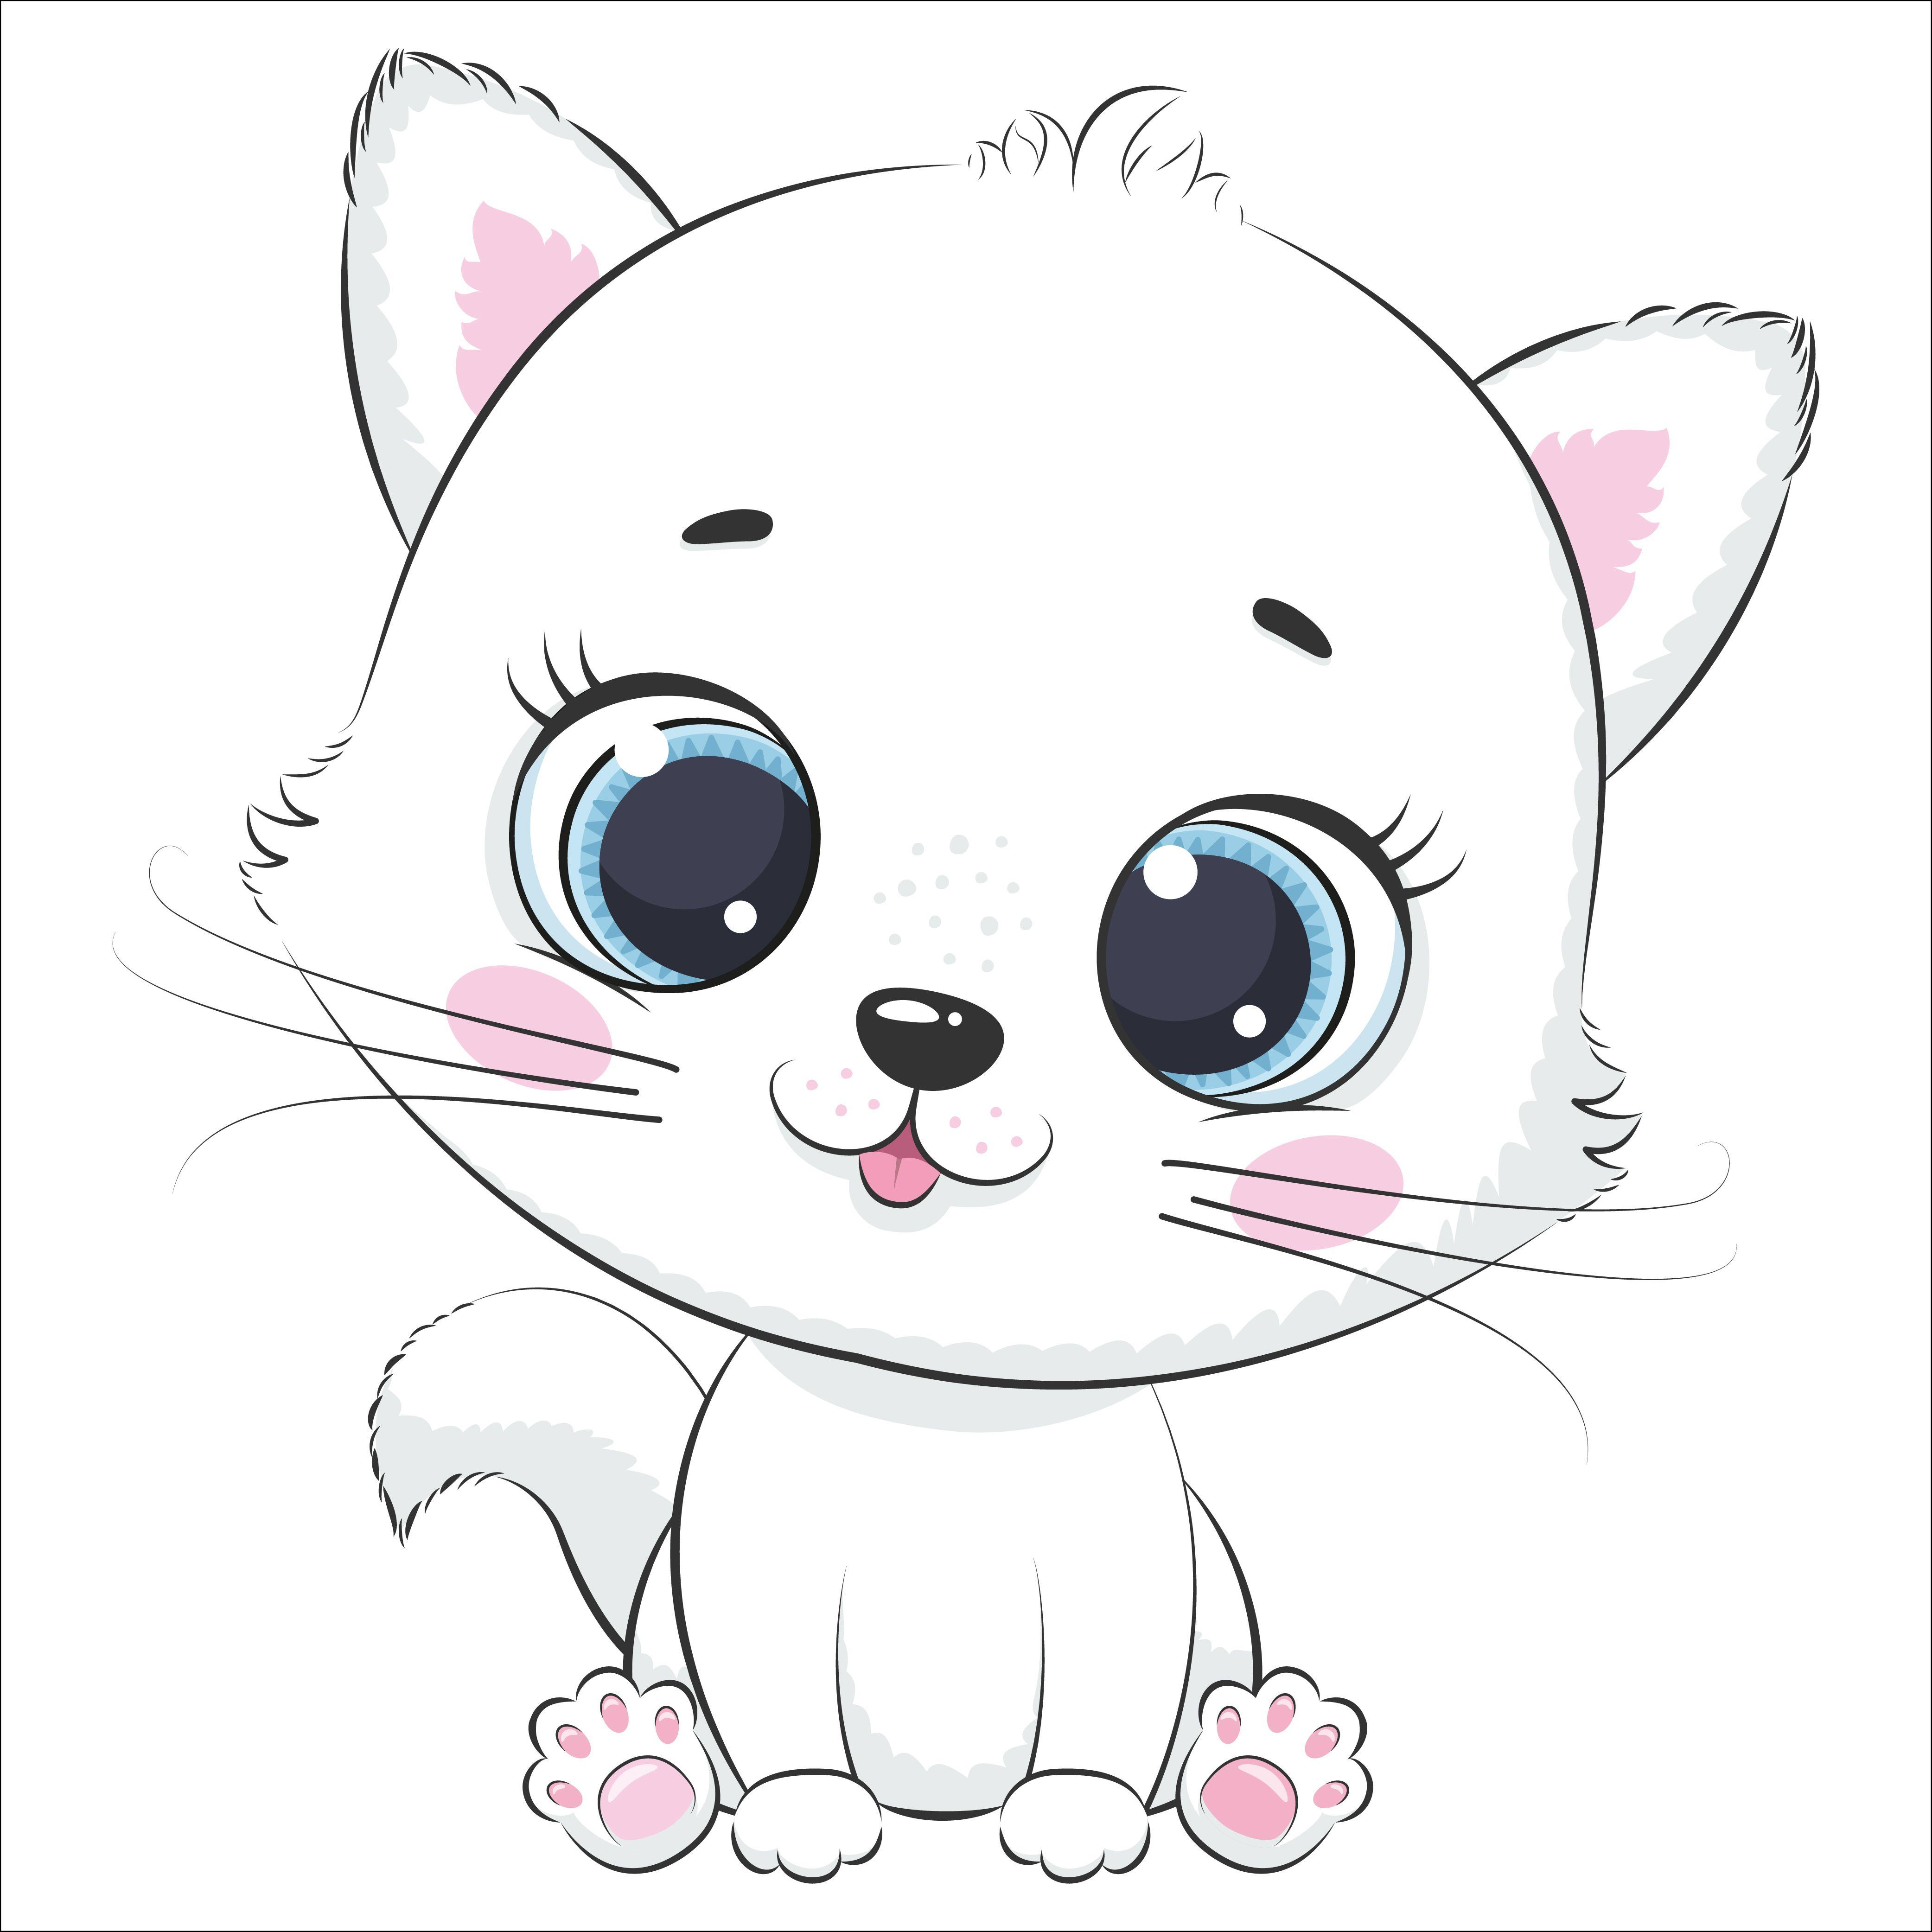 Cute Kitten Clipart Pet Illustration Png Eps Jpg Kids Clipart Baby Animal Drawings Cute Animal Drawings Cute Drawings